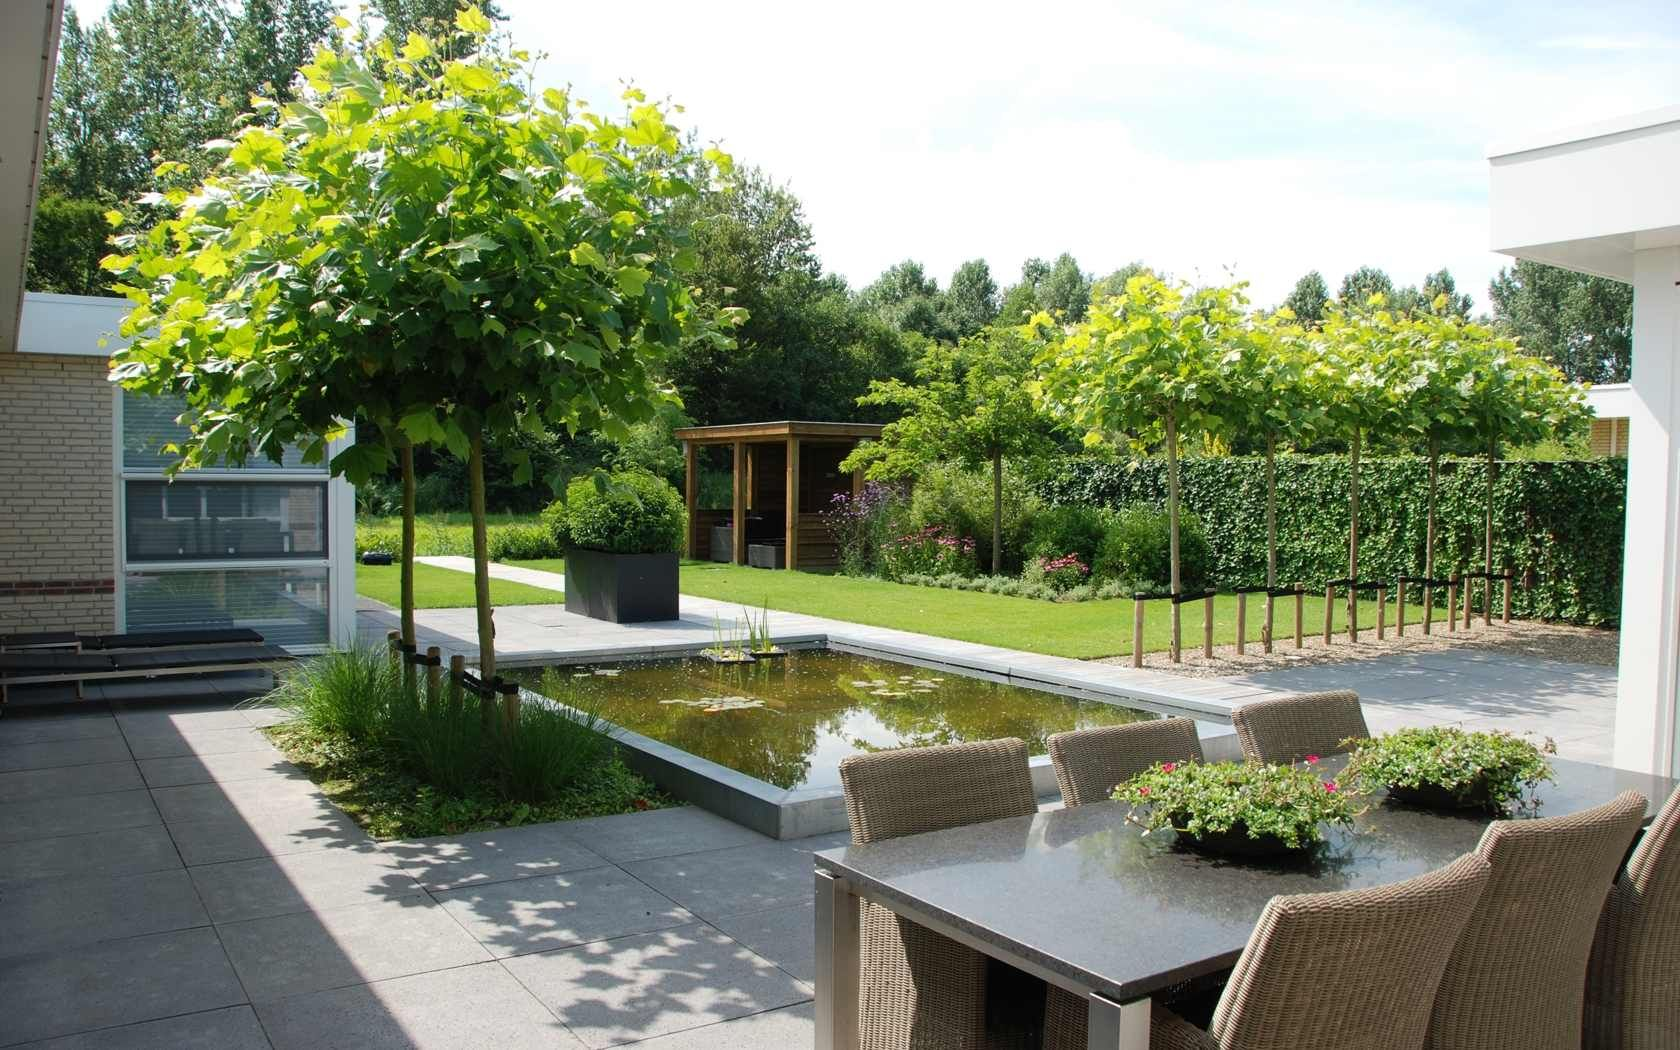 Van veen tuinontwerpen hoorn strakke lounge tuin tuin ideeën